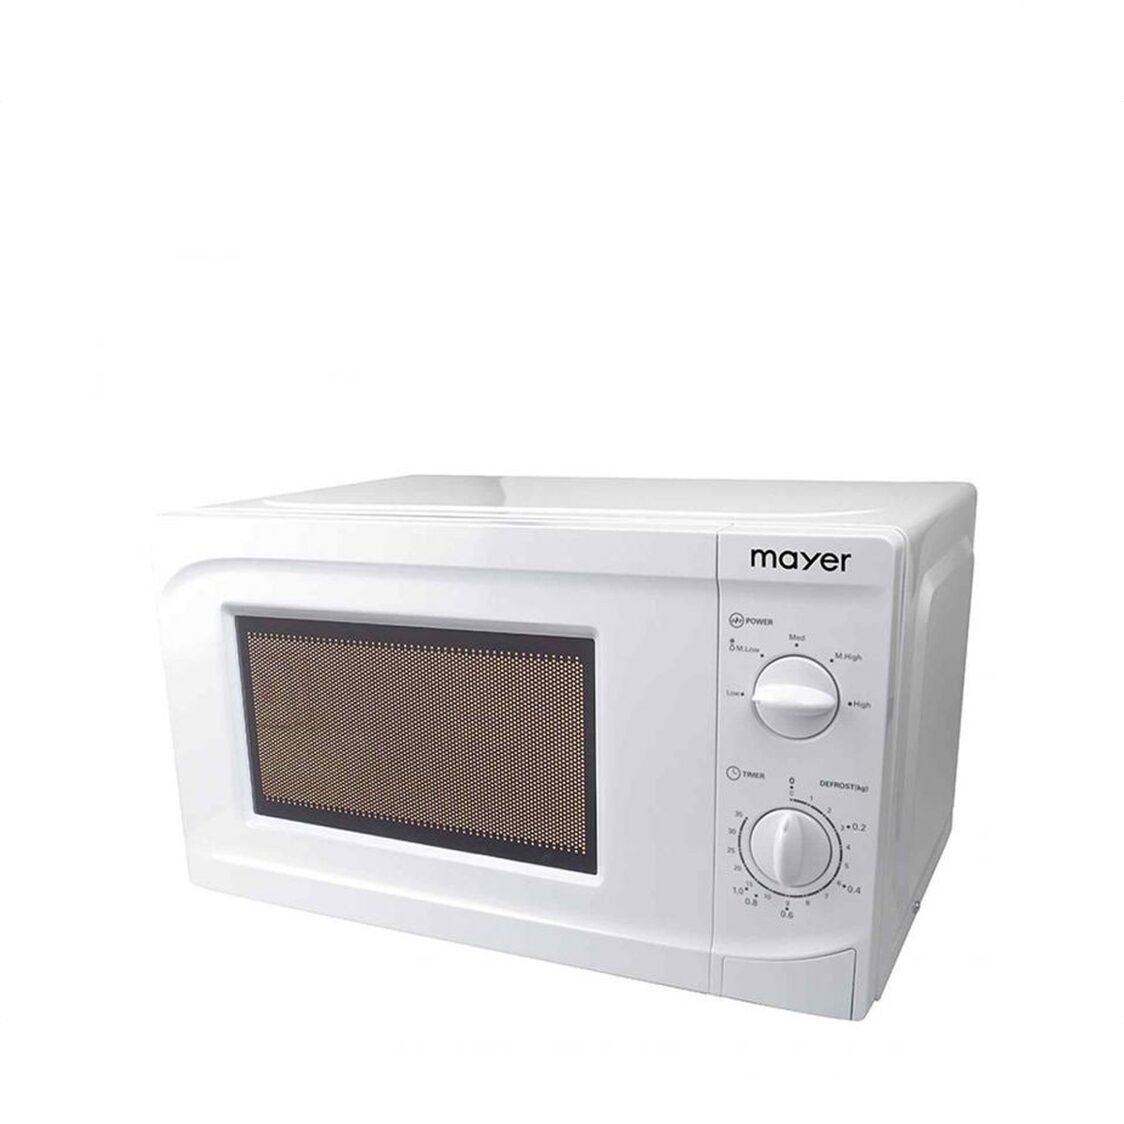 Mayer 20L Microwave